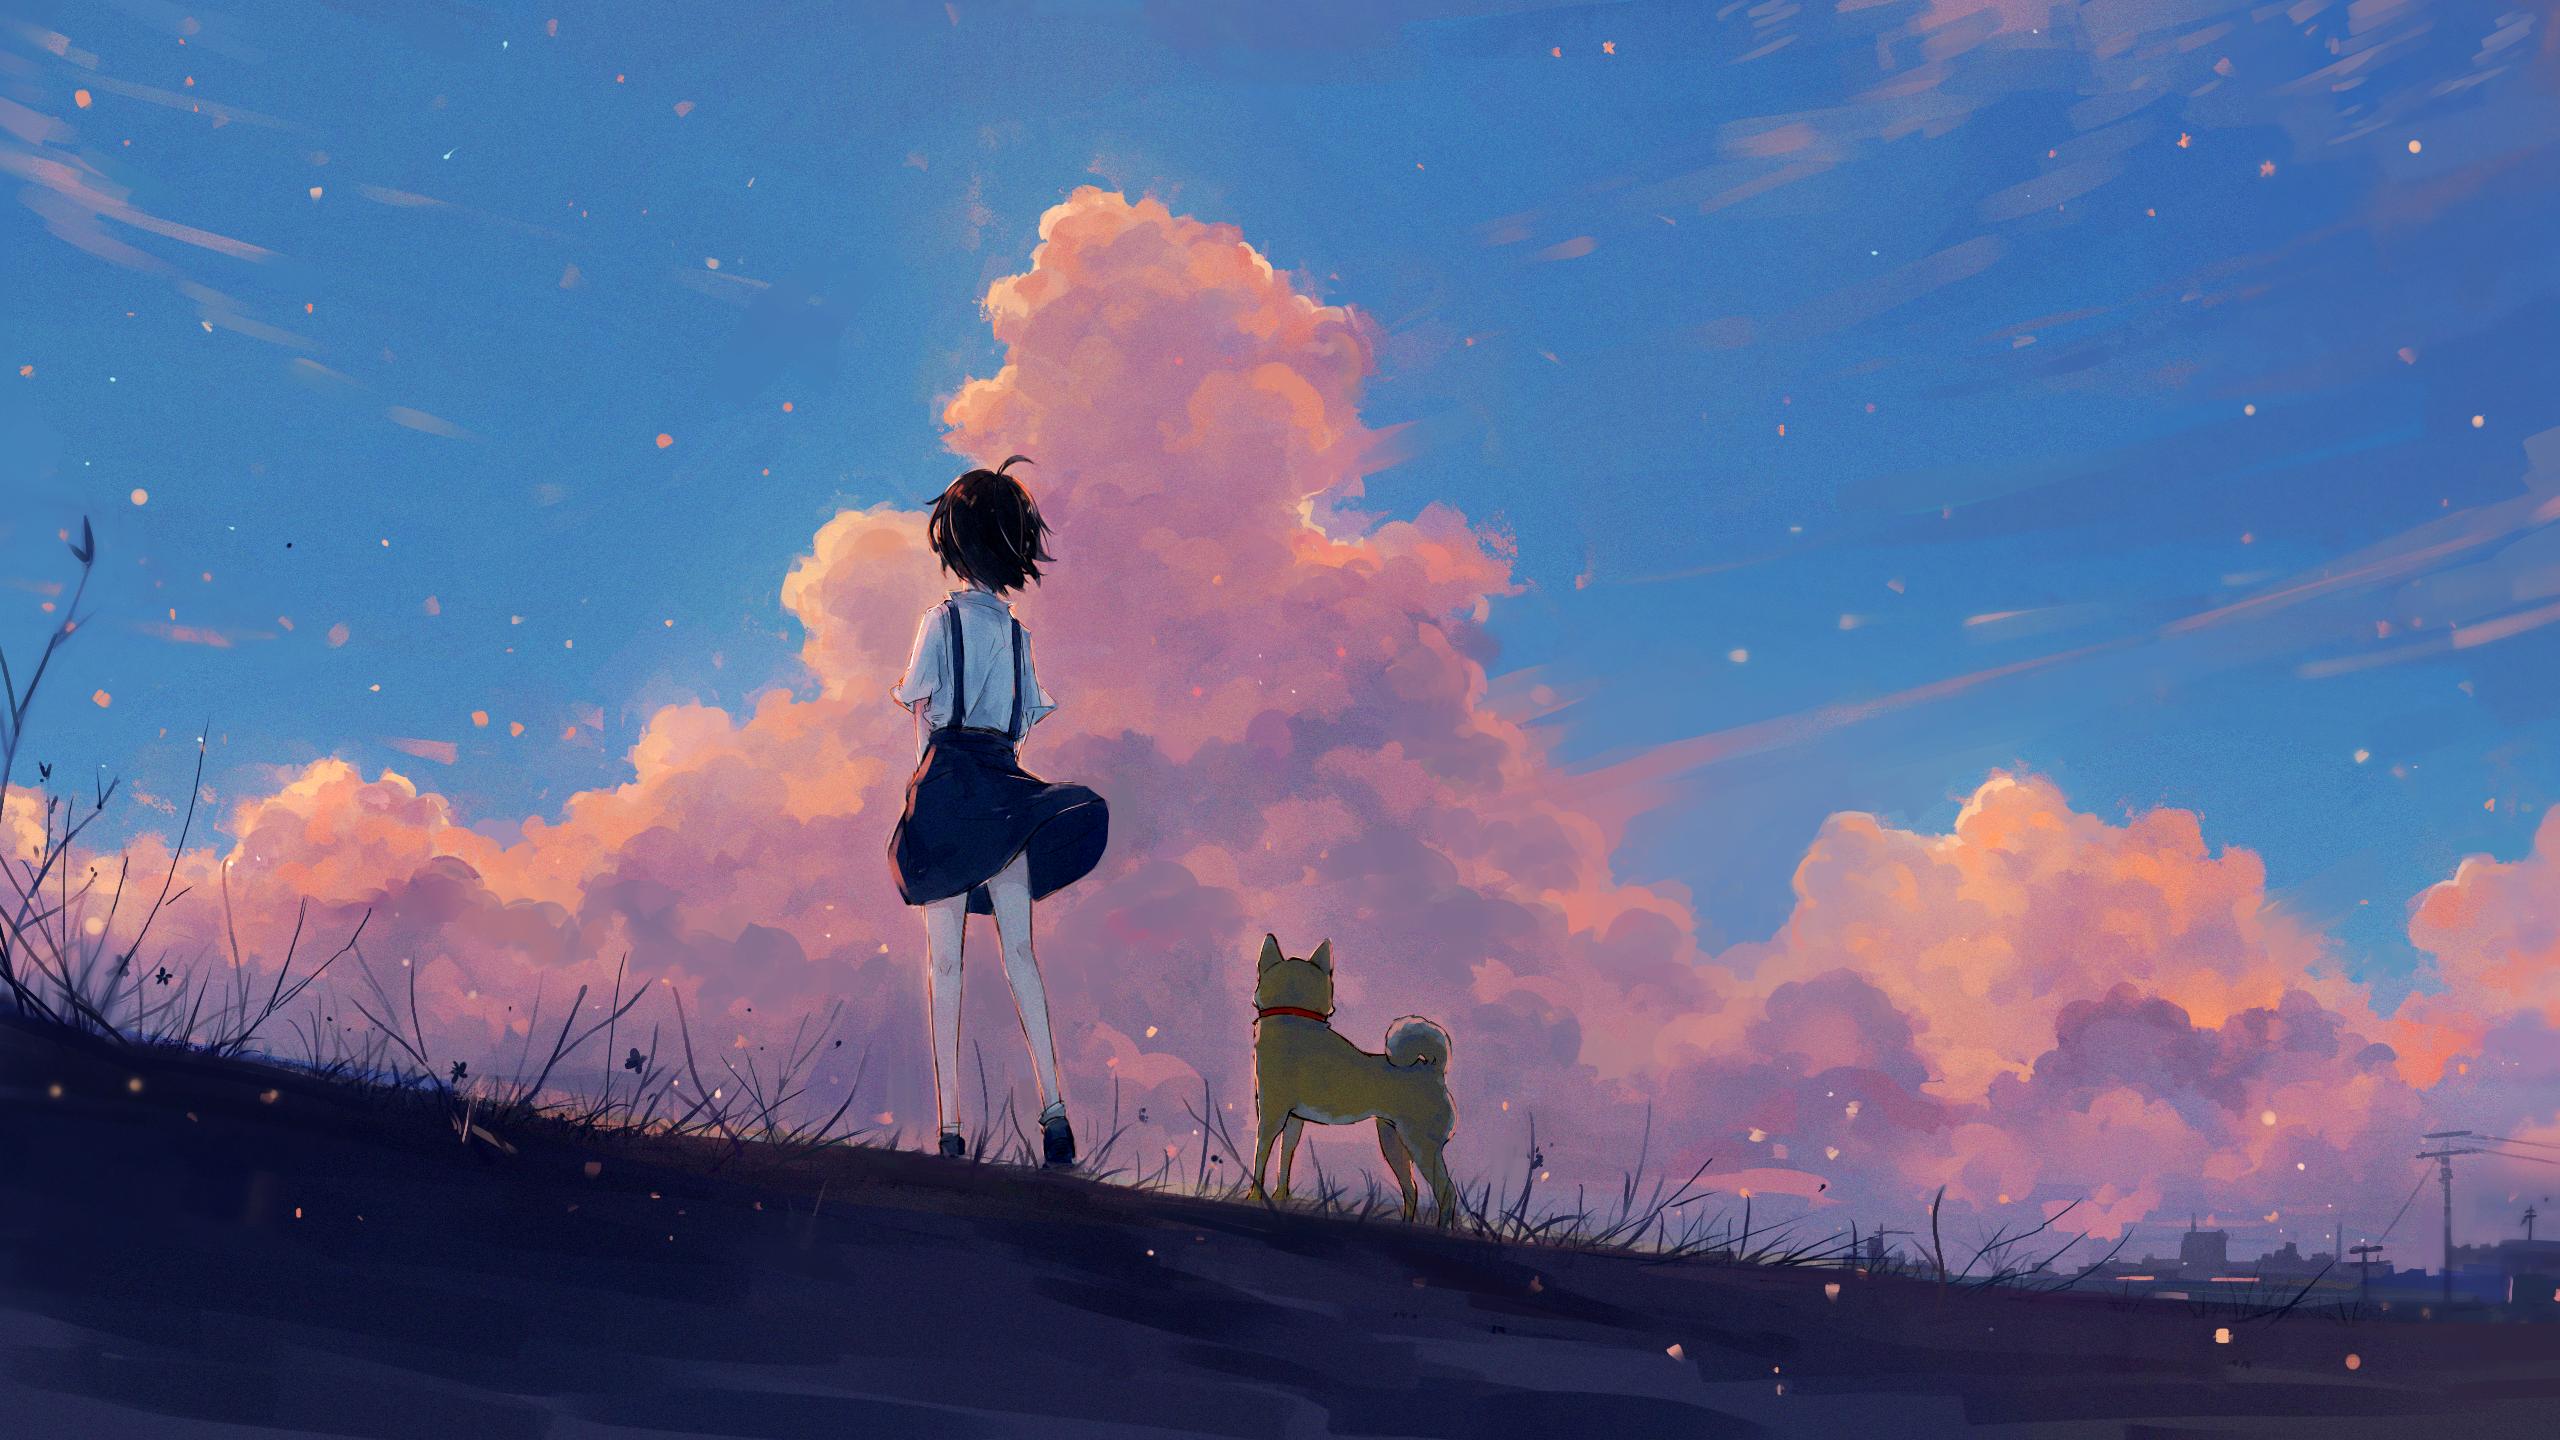 Anime 2560x1440 Artwork Anime Landscape Painting Fan Art Anime Girls Dog Illustration Anime Scenery Wallpaper Scenery Wallpaper Anime Scenery